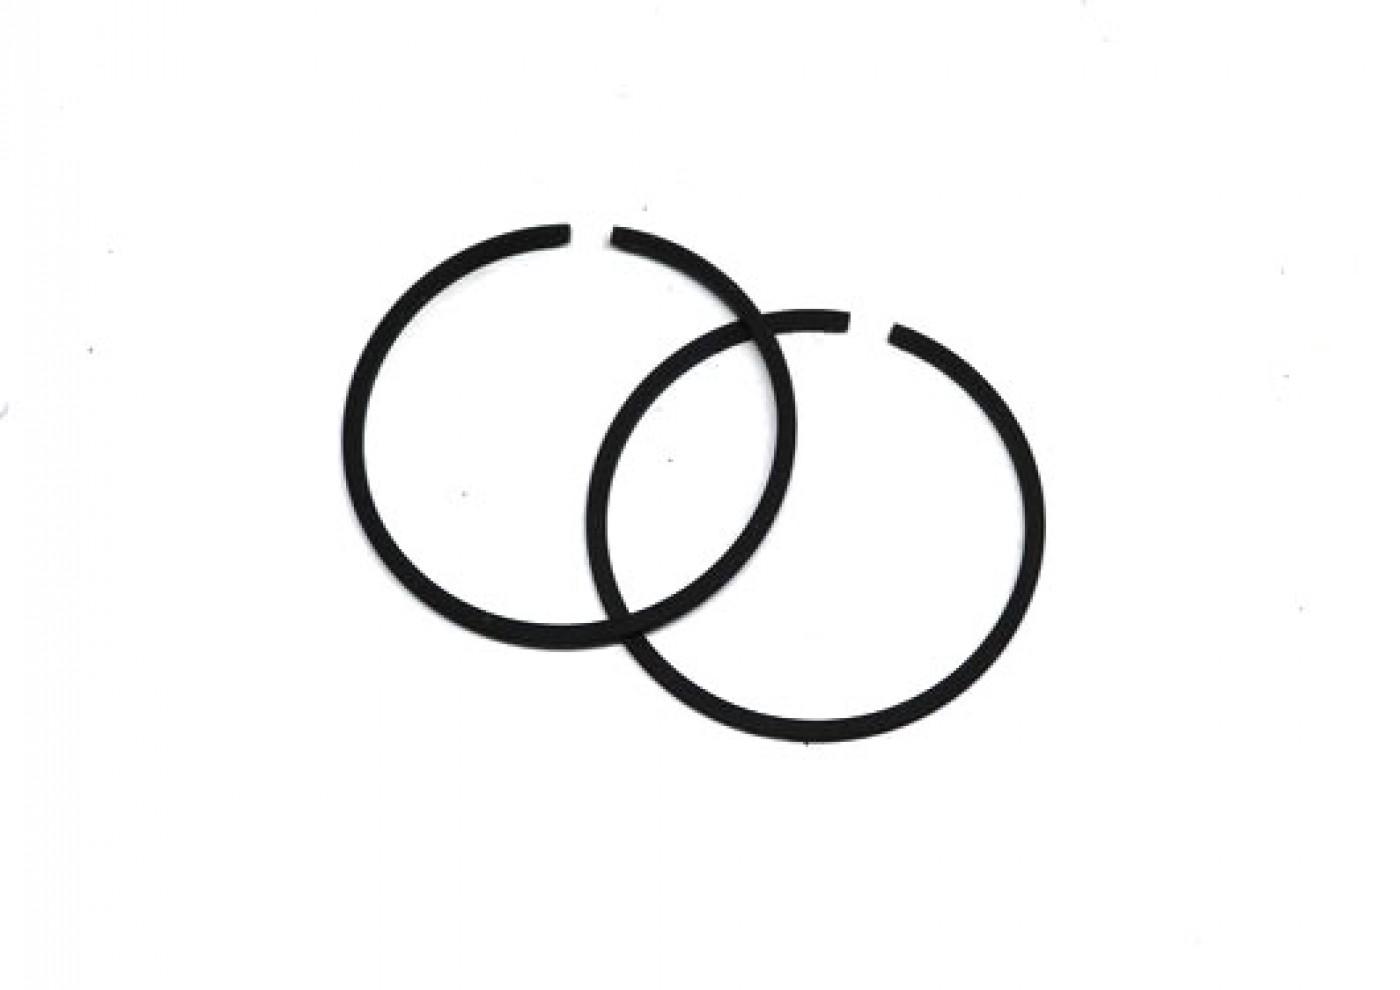 Sada kroužků 40 mm x 1,2 mm